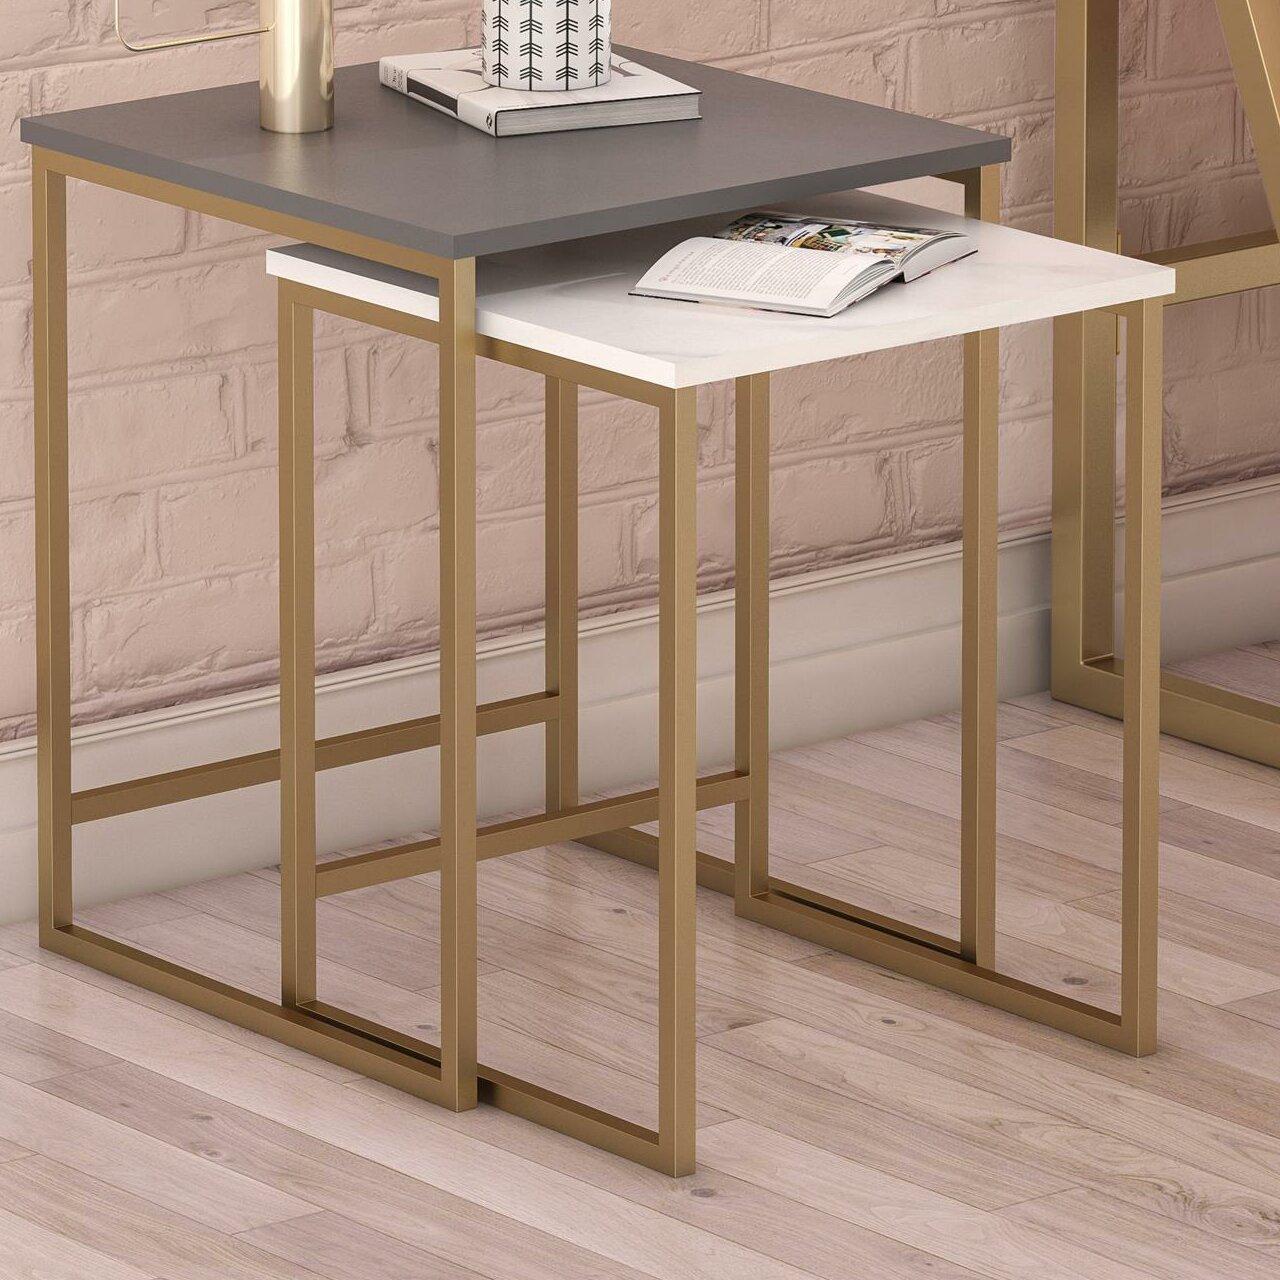 Cosmoliving By Cosmopolitan Scarlett 2 Piece Nesting Tables Reviews Wayfair